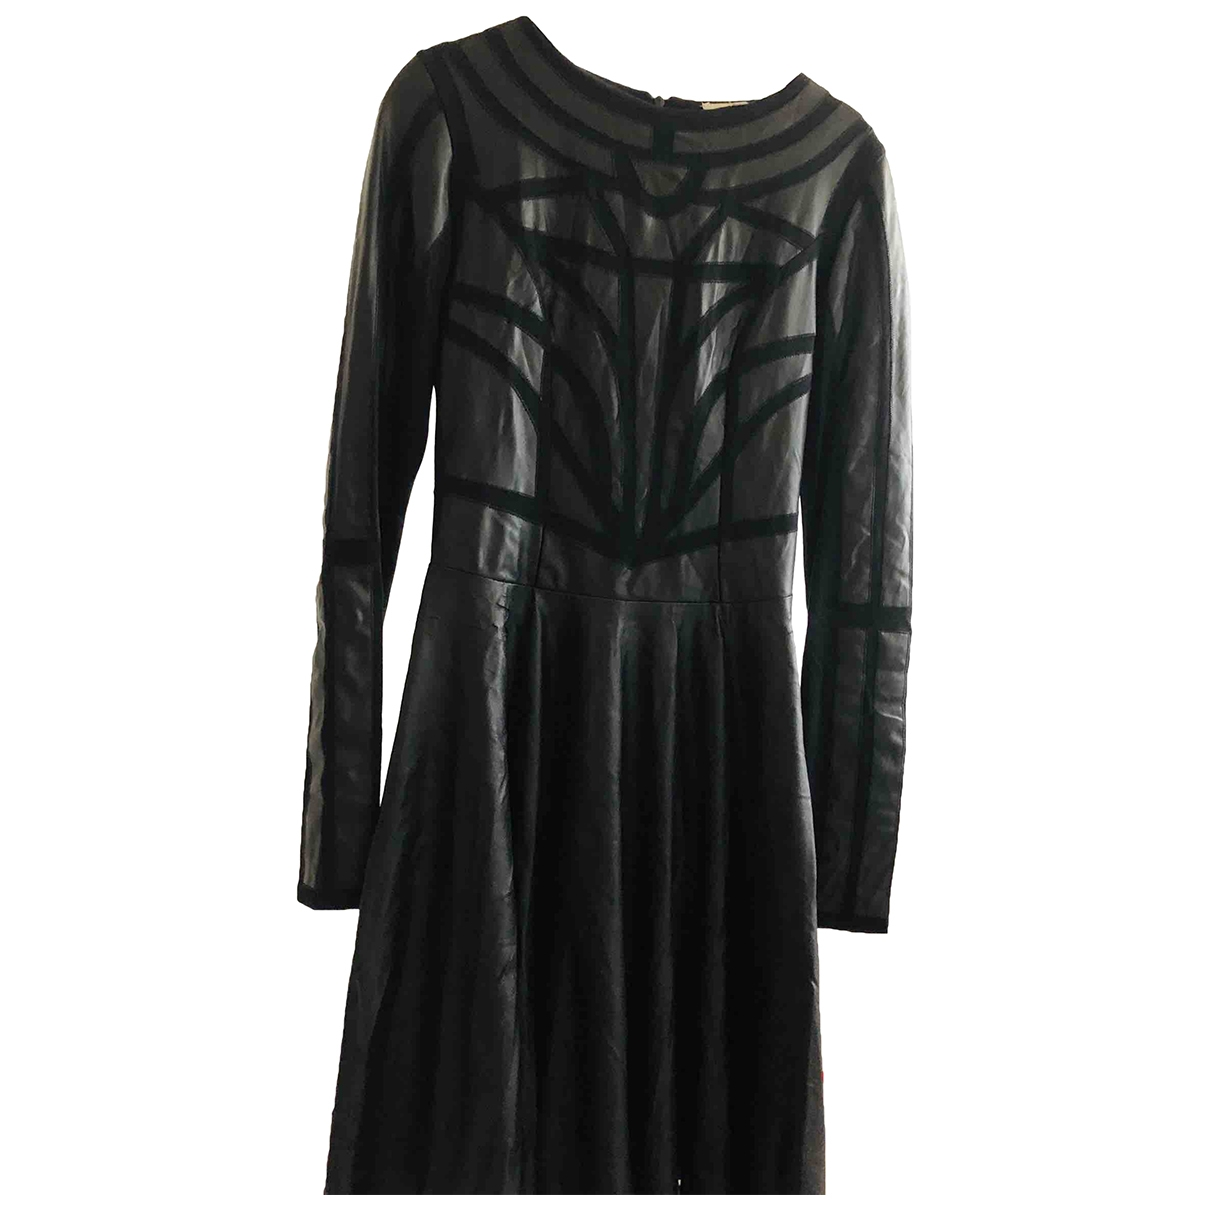 Amen Italy \N Kleid in  Schwarz Synthetik